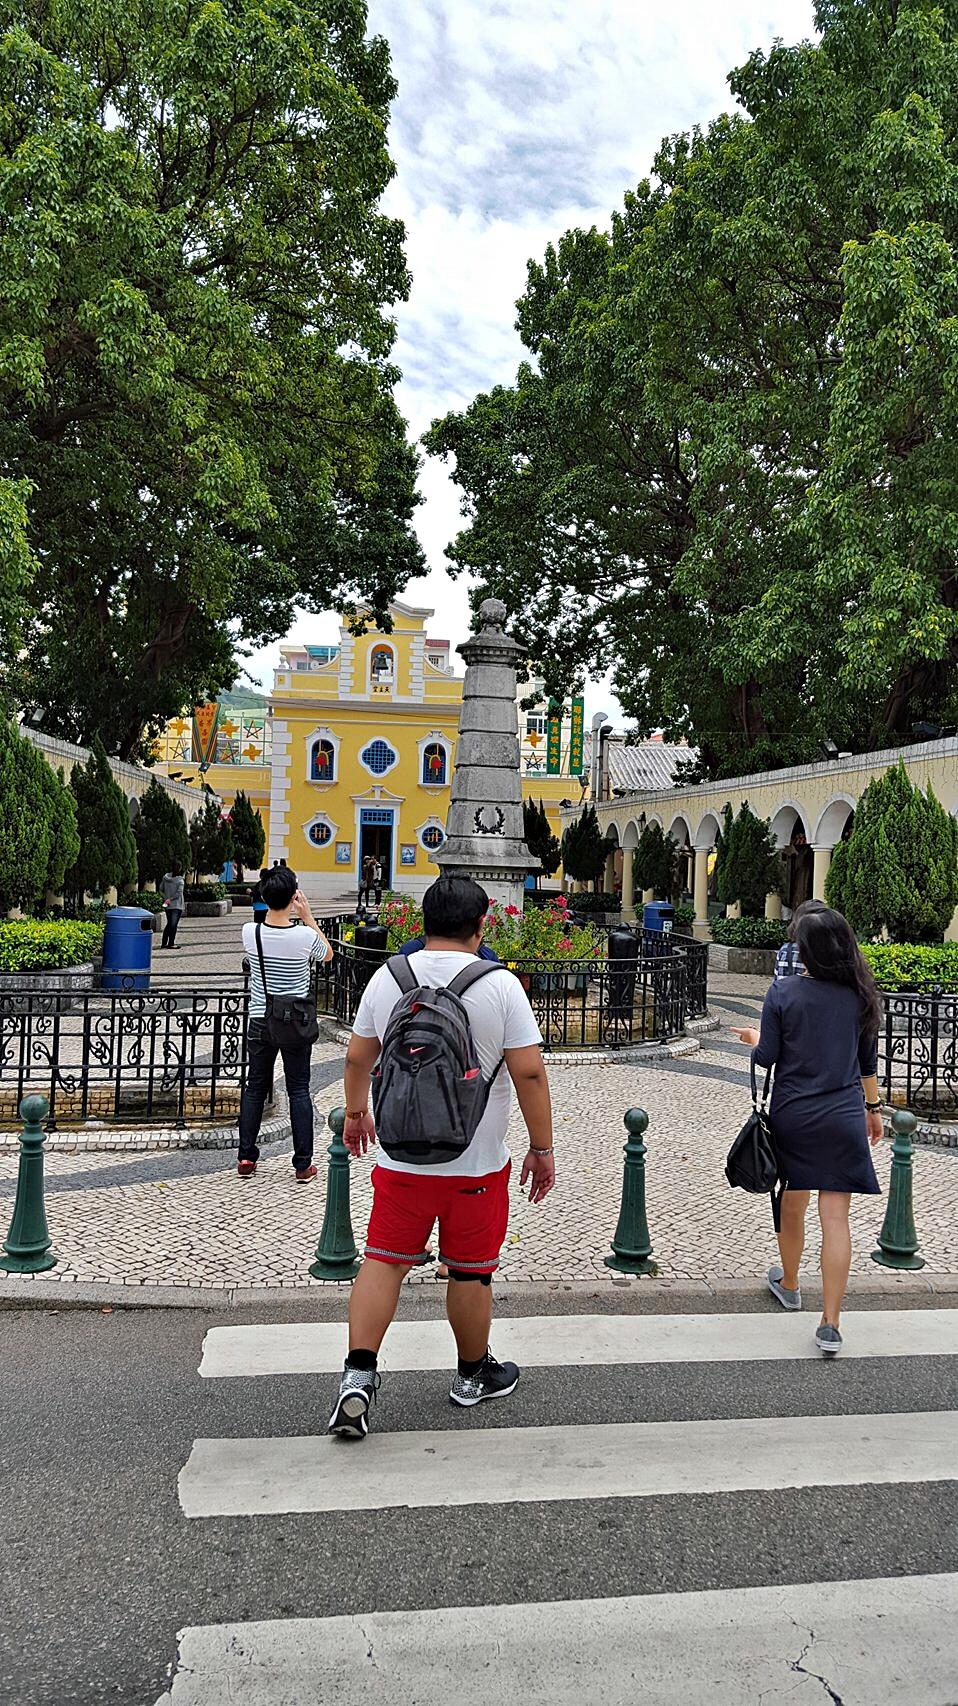 6 Nov 2015: Coloane Village | Macau, China